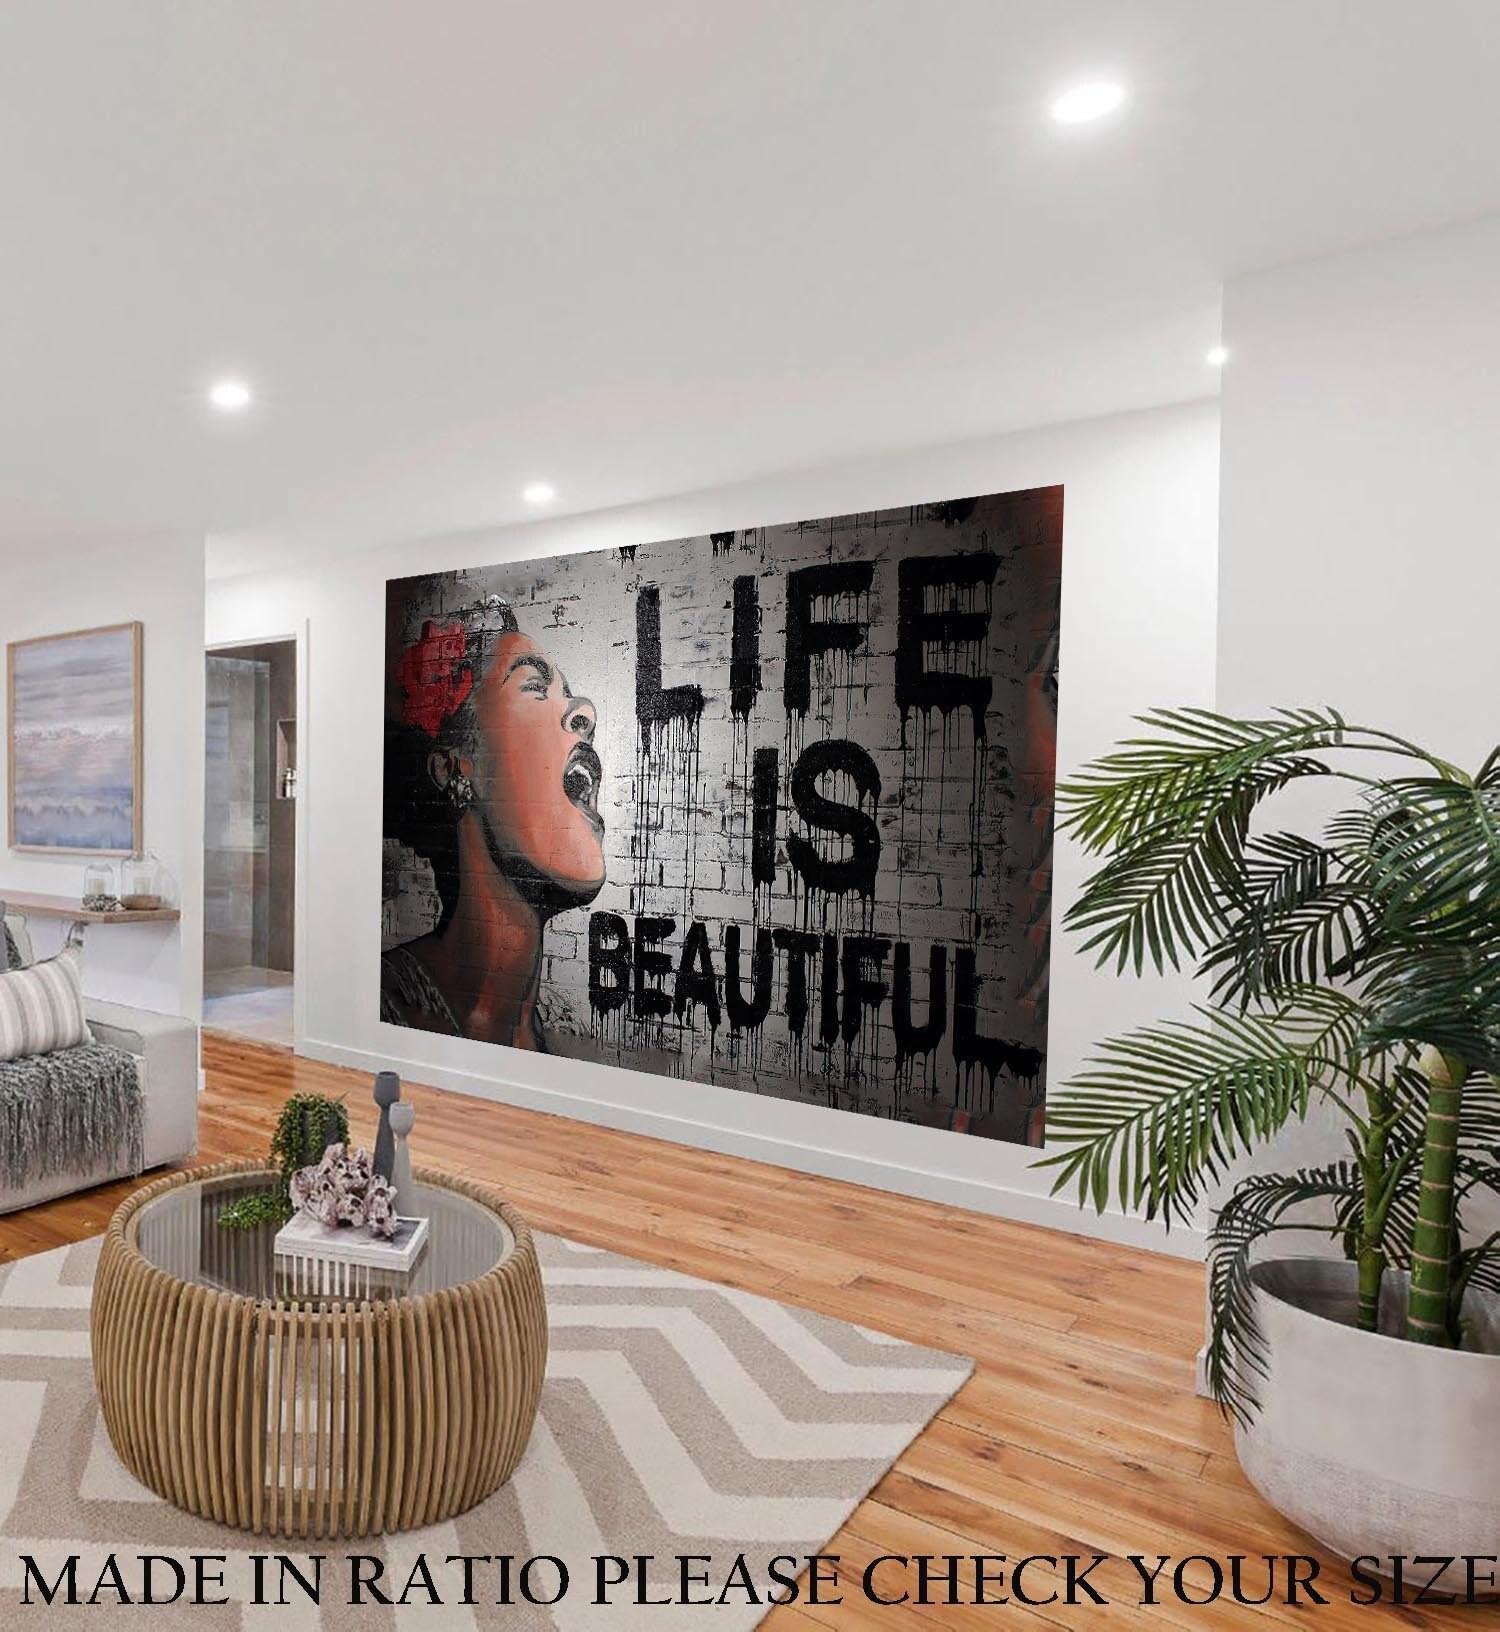 Life is beautiful street art graffiti painting canvas not banksy abstract print stencil urban wall decor